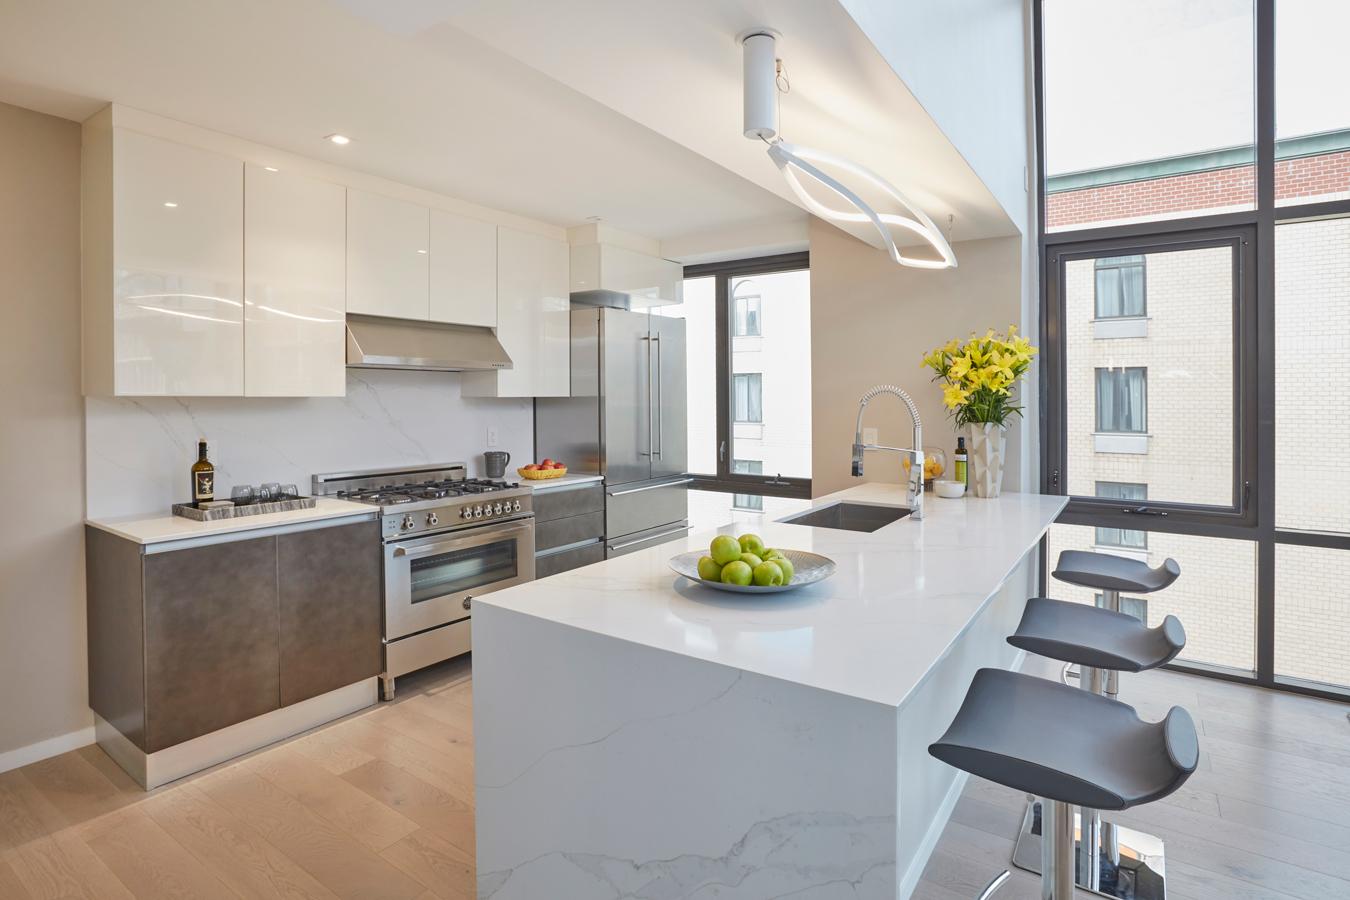 arcadia-lic-kitchen.jpg